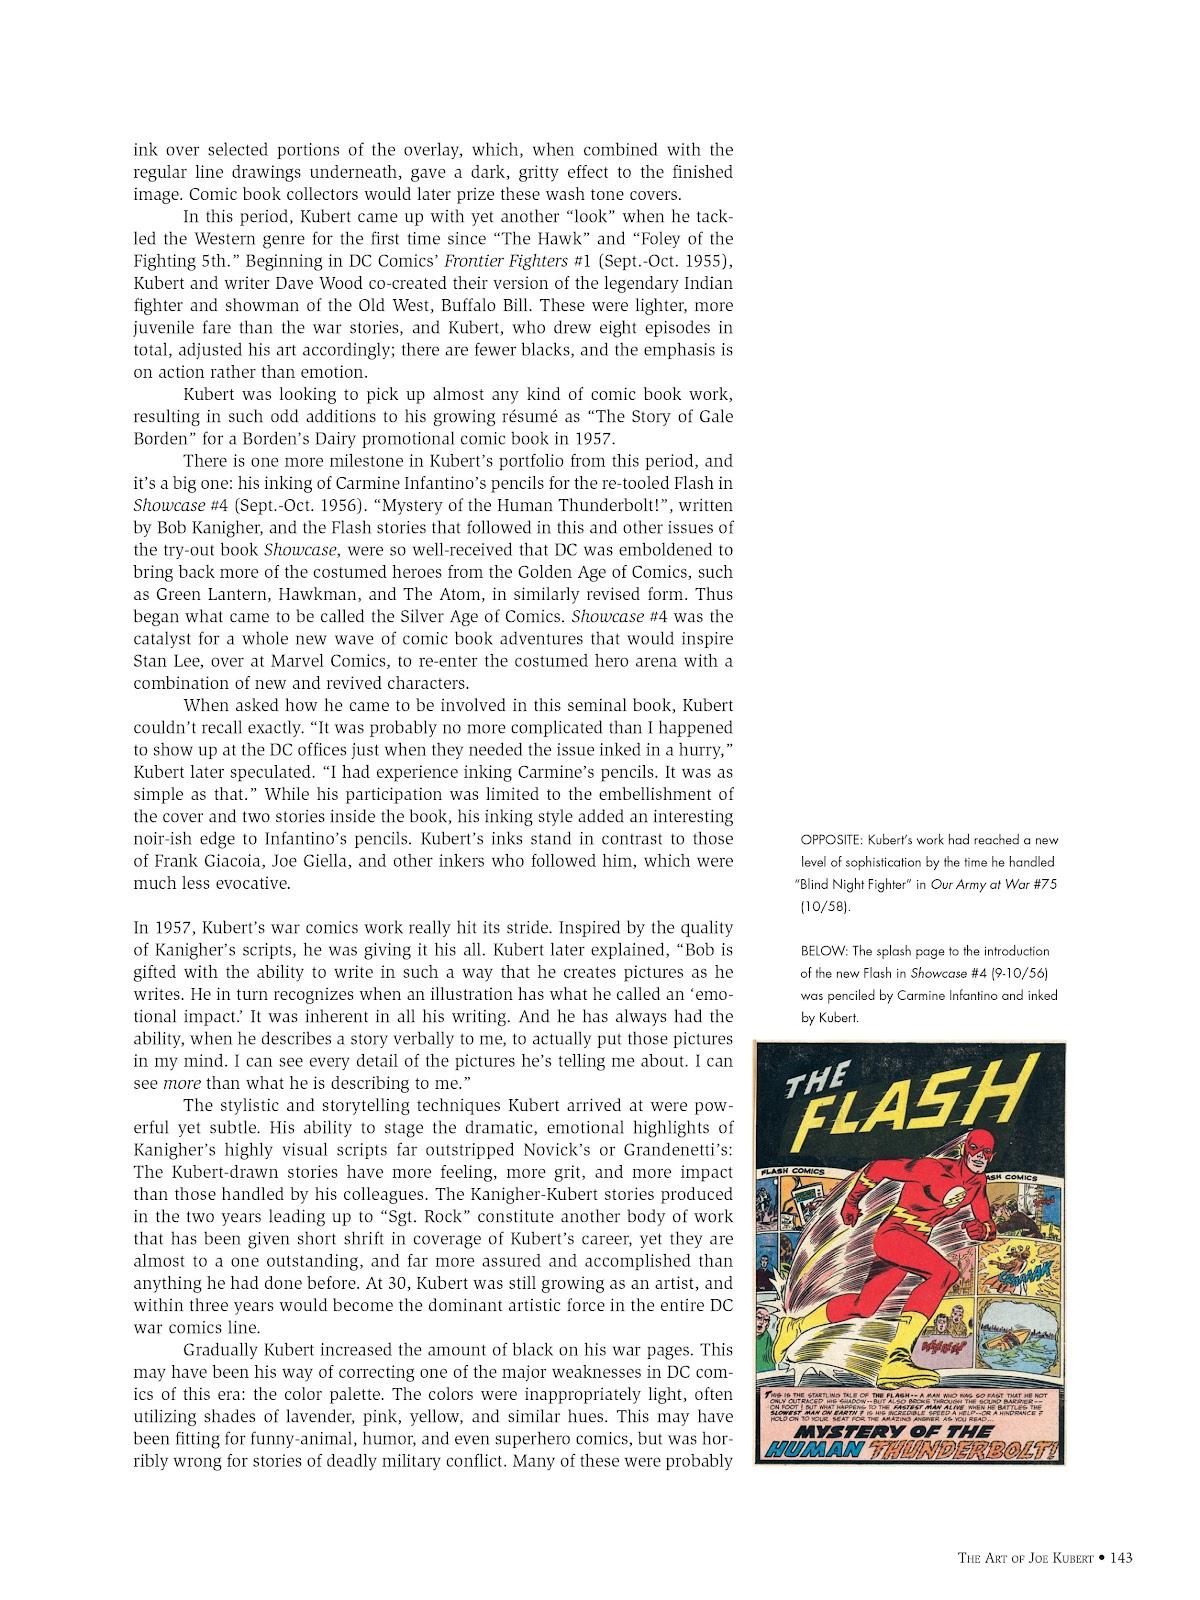 Read online The Art of Joe Kubert comic -  Issue # TPB (Part 2) - 43